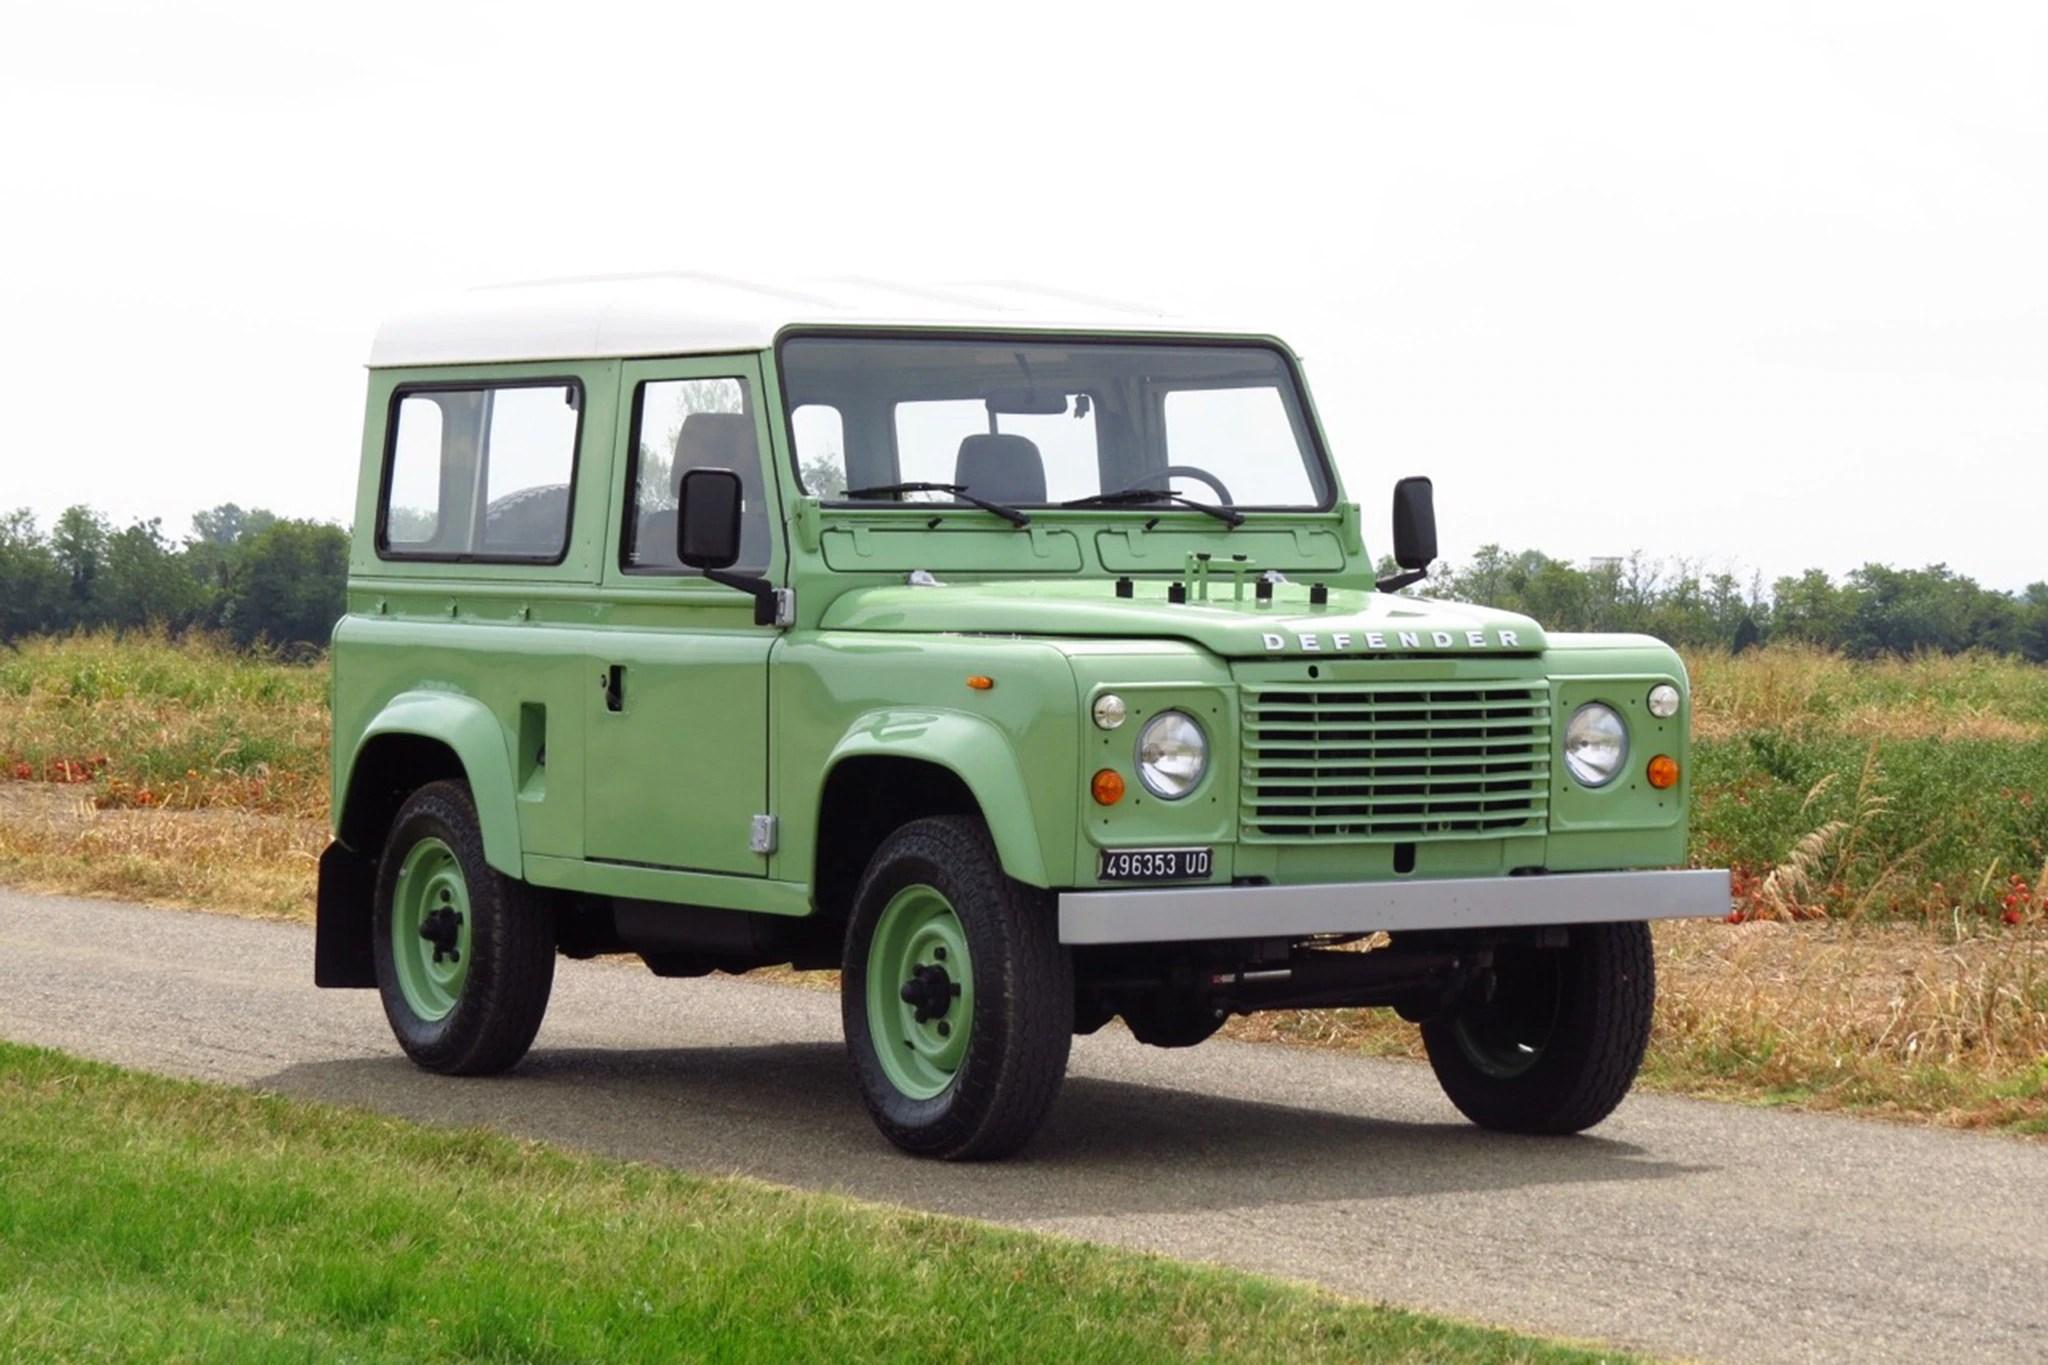 Jaguar Land Rover to Introduce More SVX Models Says Report